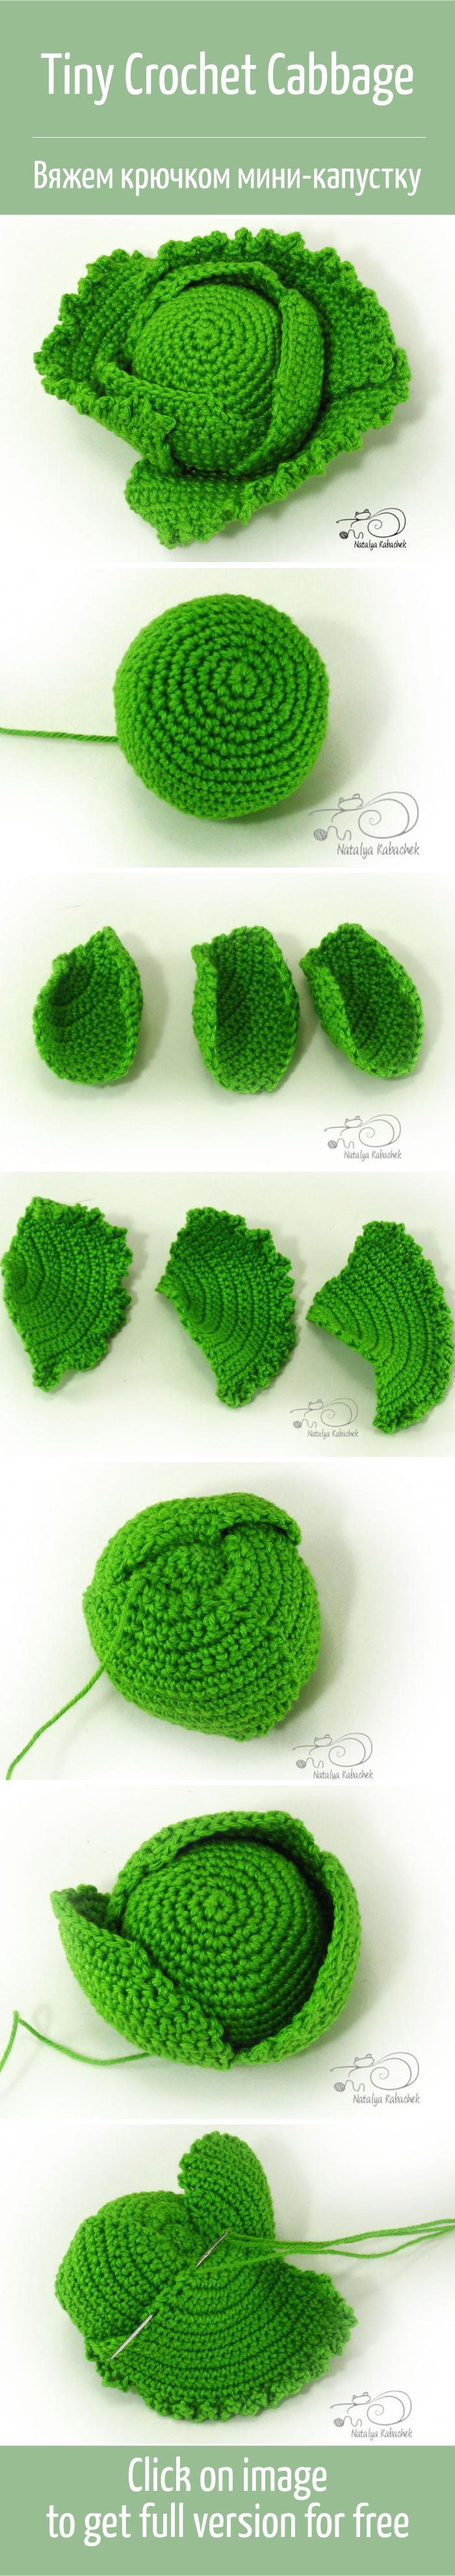 100 best crochet patterns images on Pinterest | Baby knitting ...